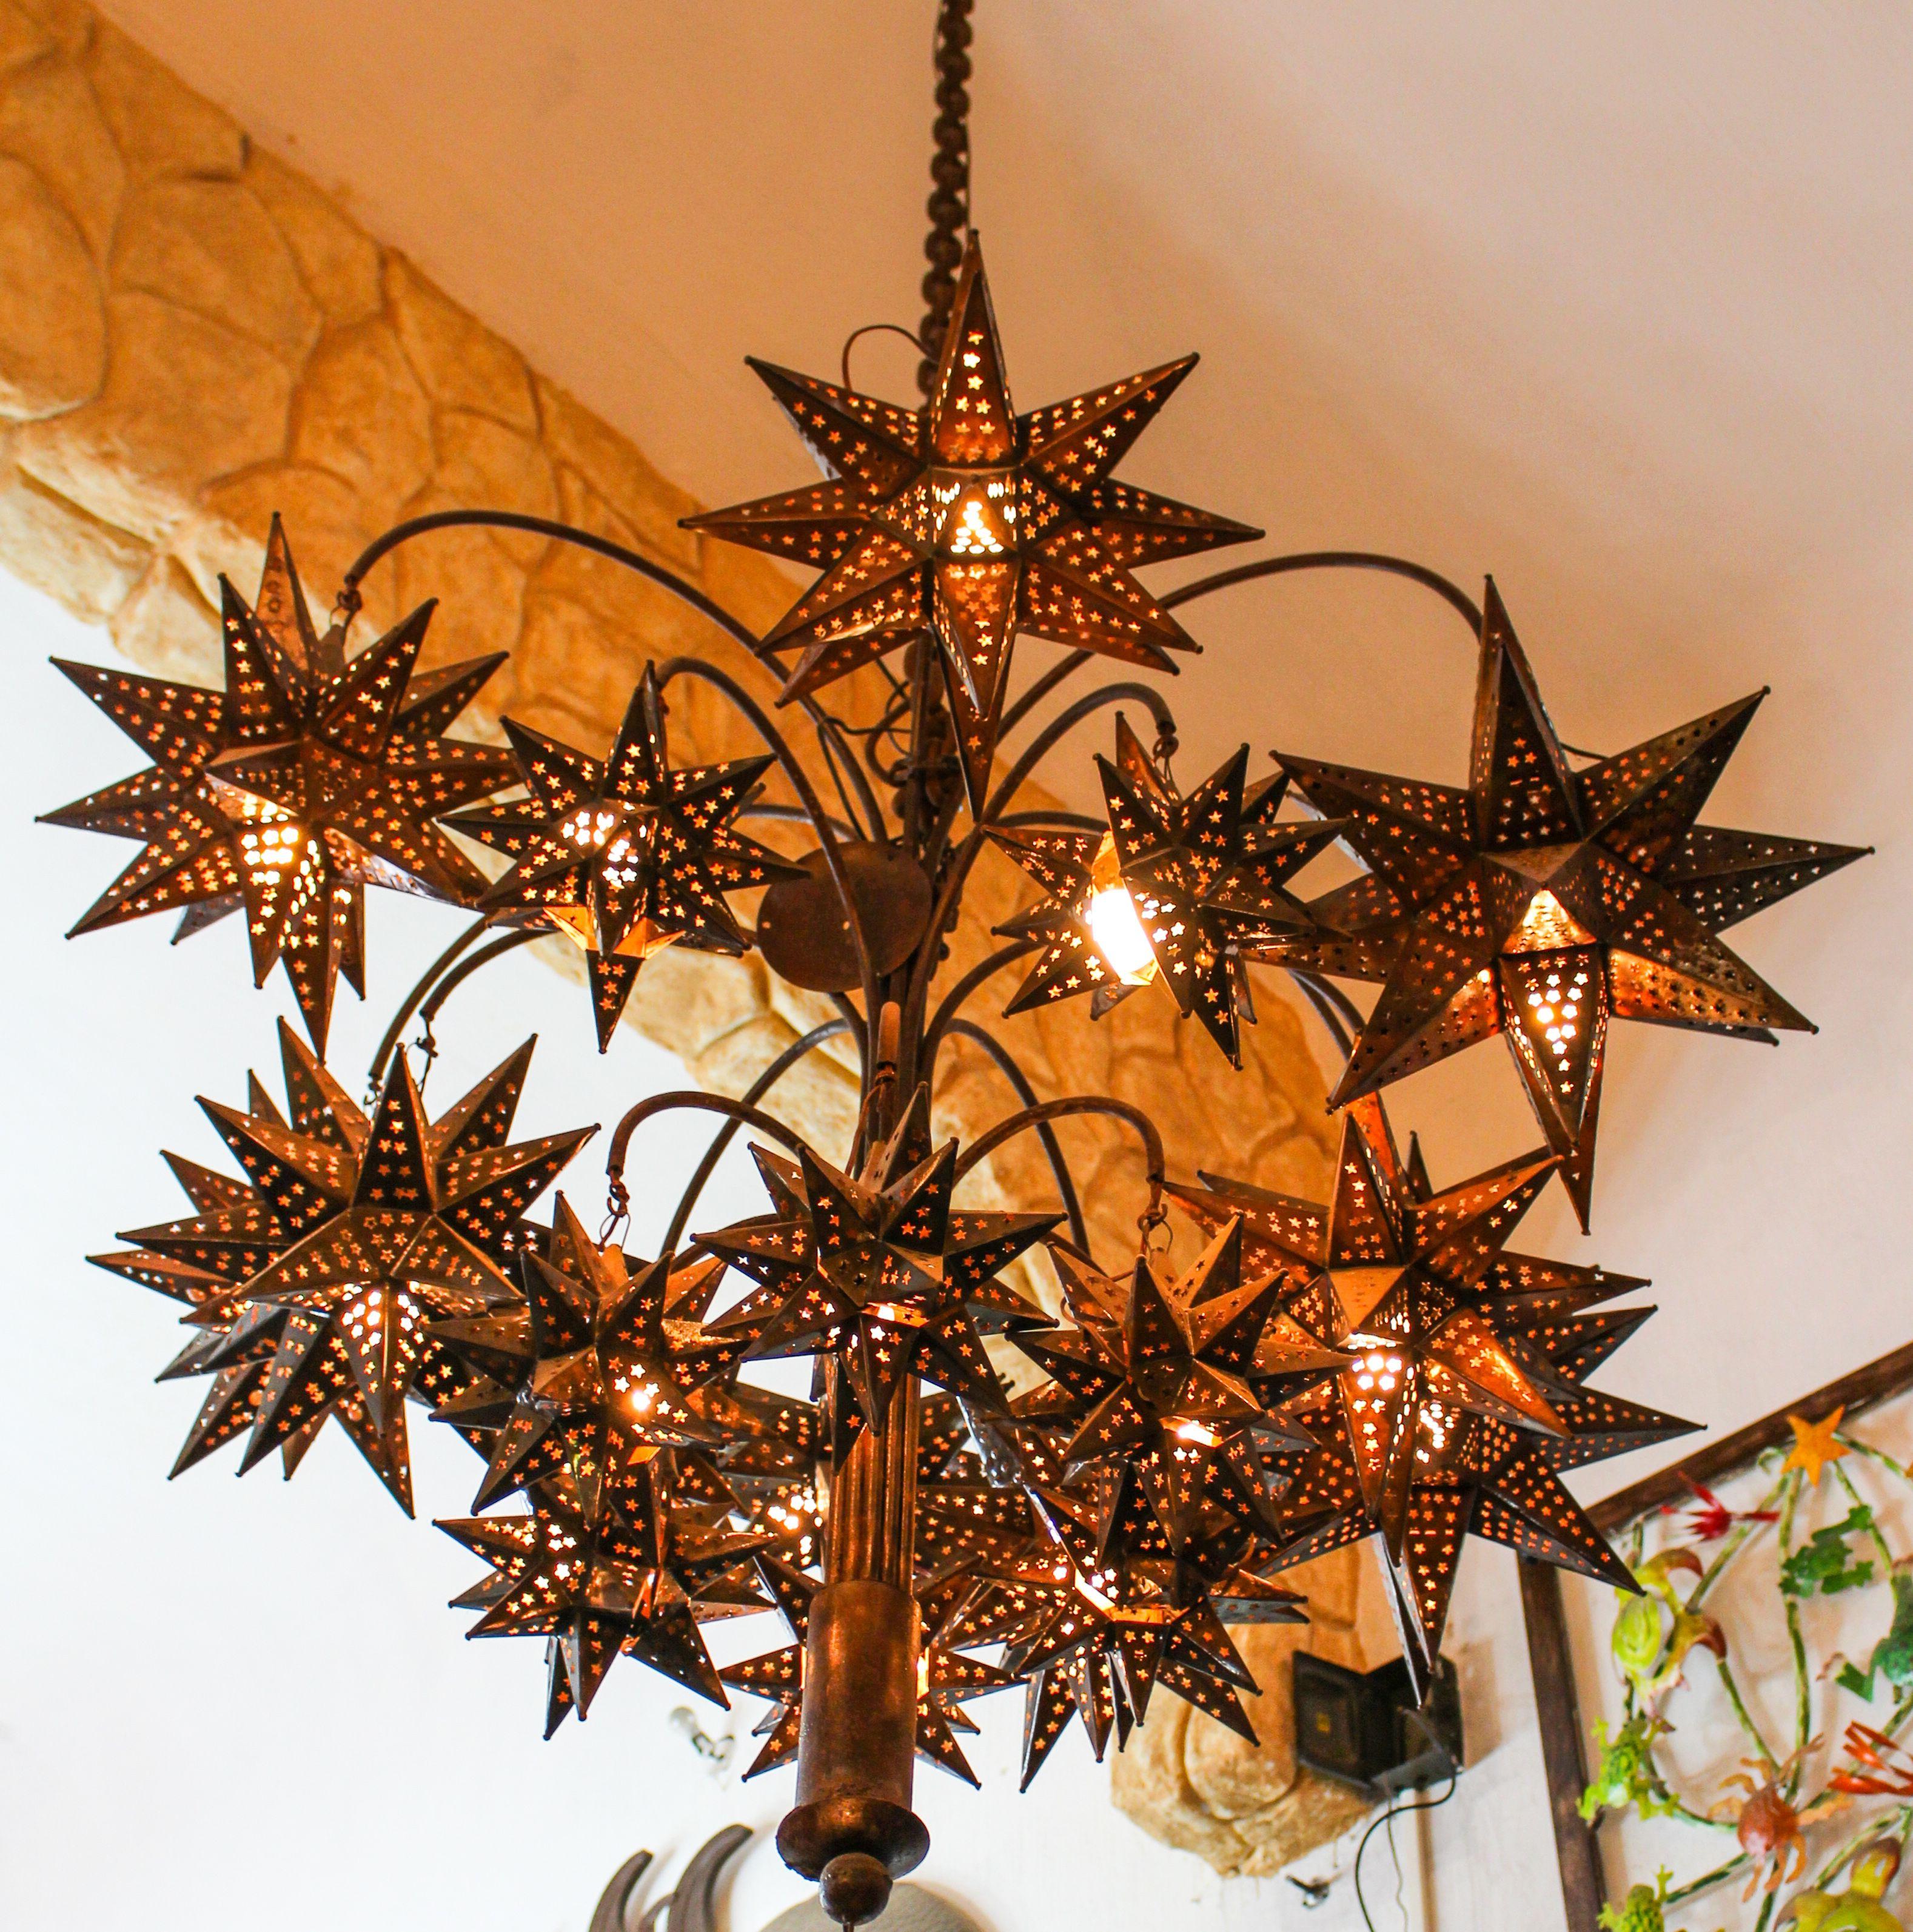 El Callejon Art- Tin And Glass Stars In